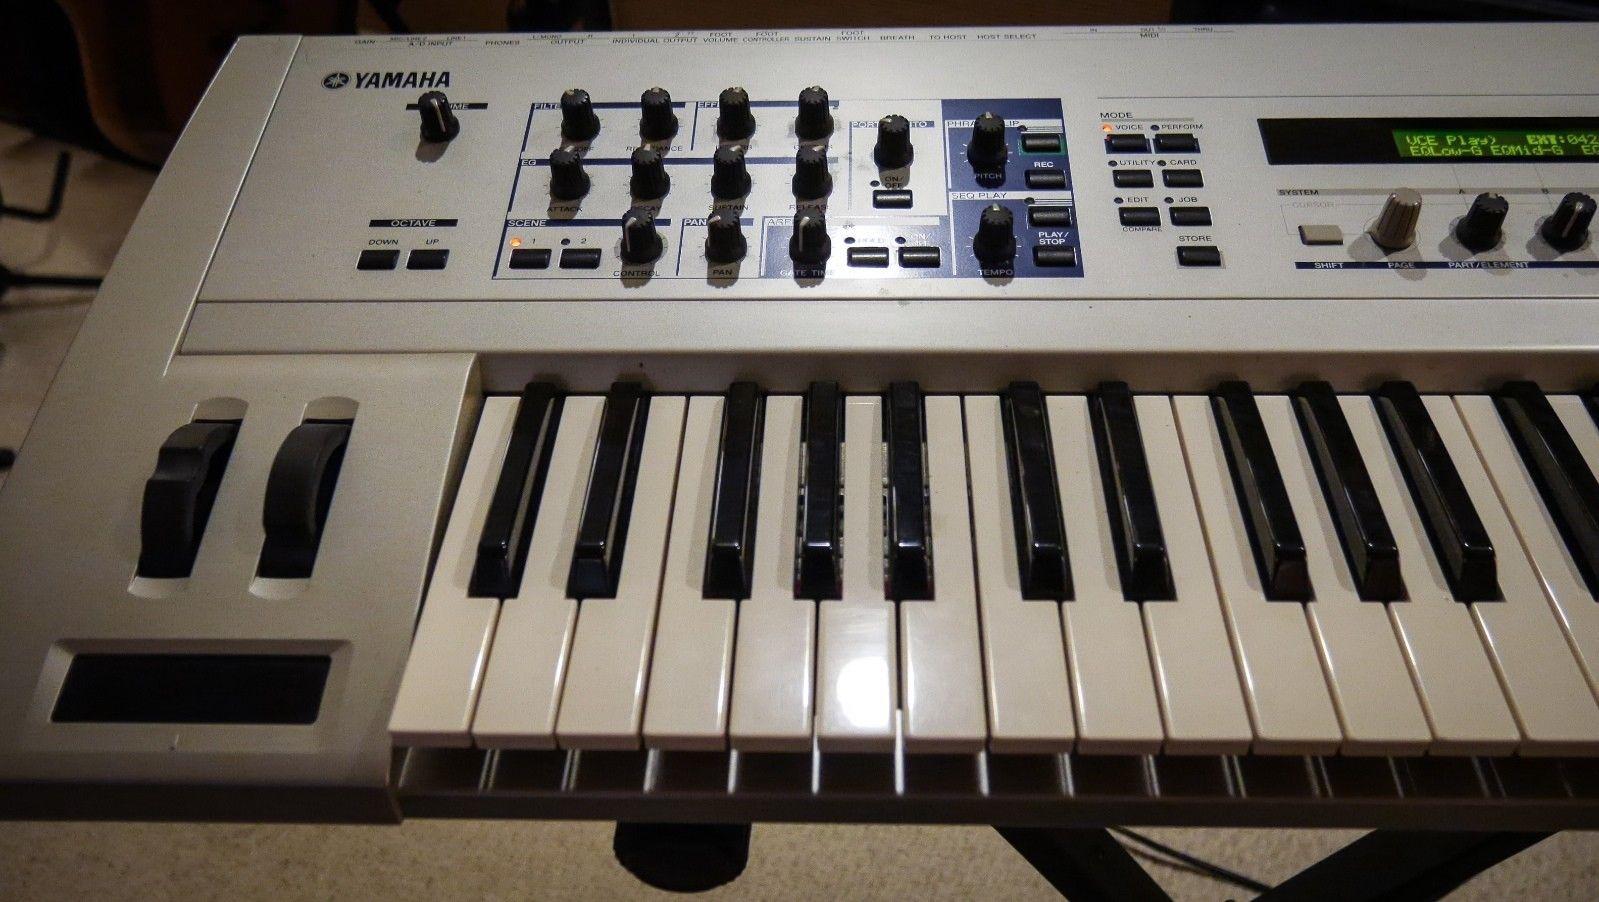 MATRIXSYNTH: Yamaha CS6x Keyboard Synth